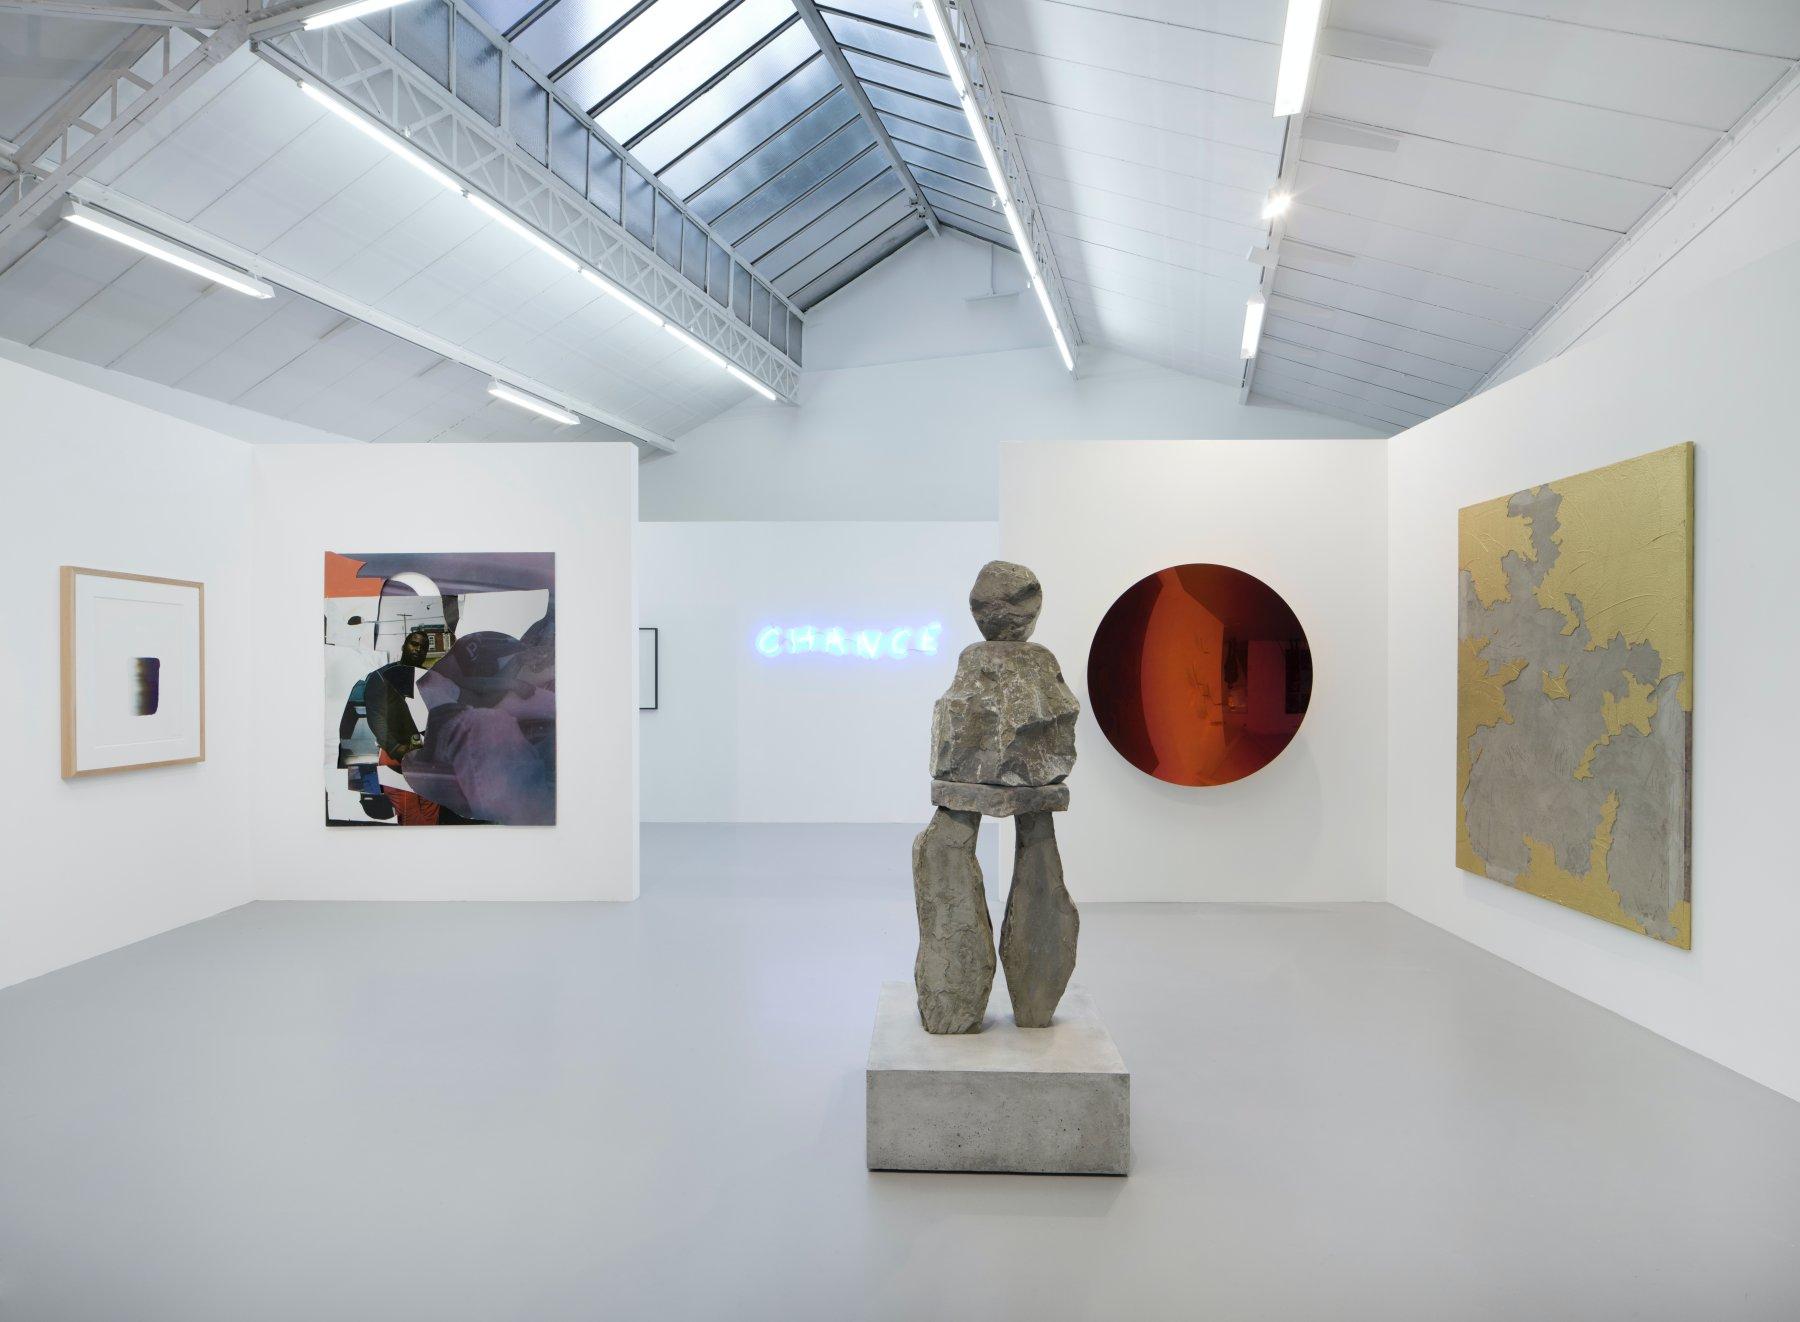 kamel mennour FIAC in the galleries 1